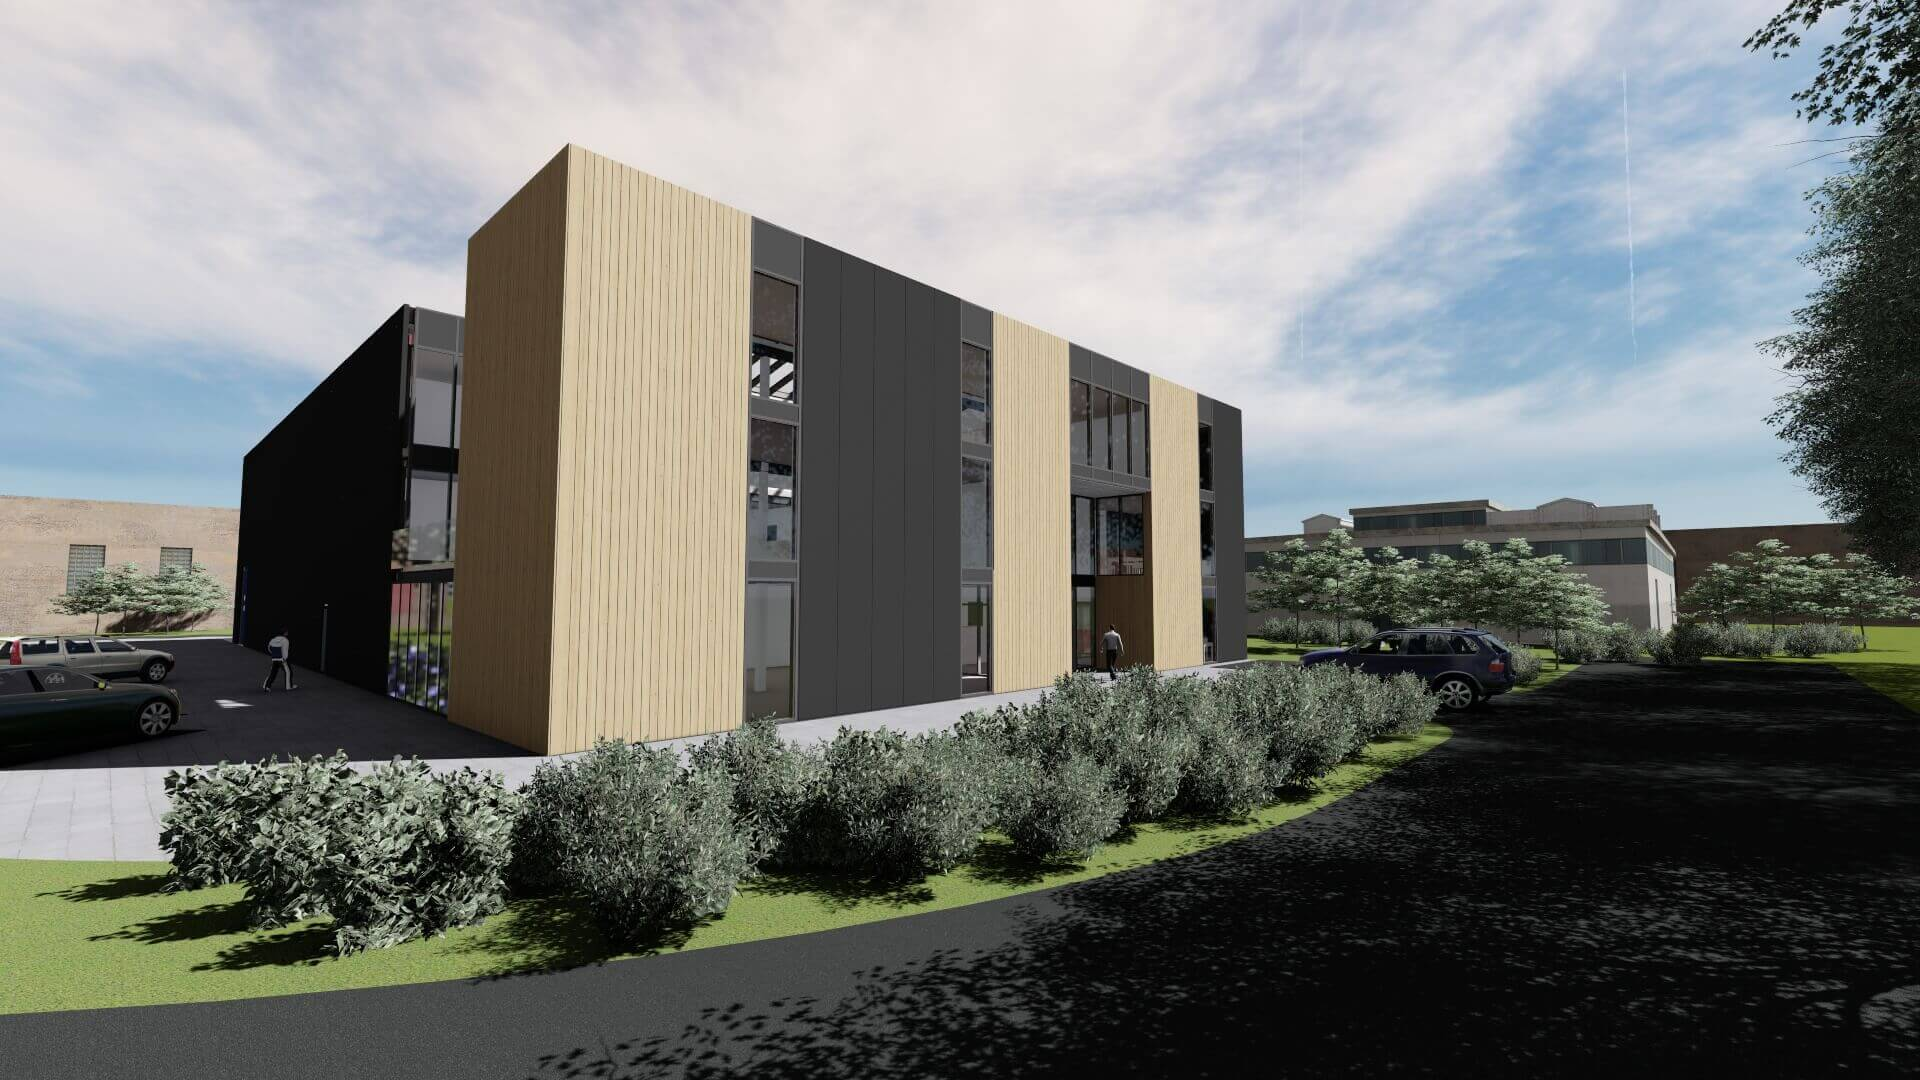 Nieuwbouw bedrijfspand Etikon Nederland | Wijnja Groep B.V.